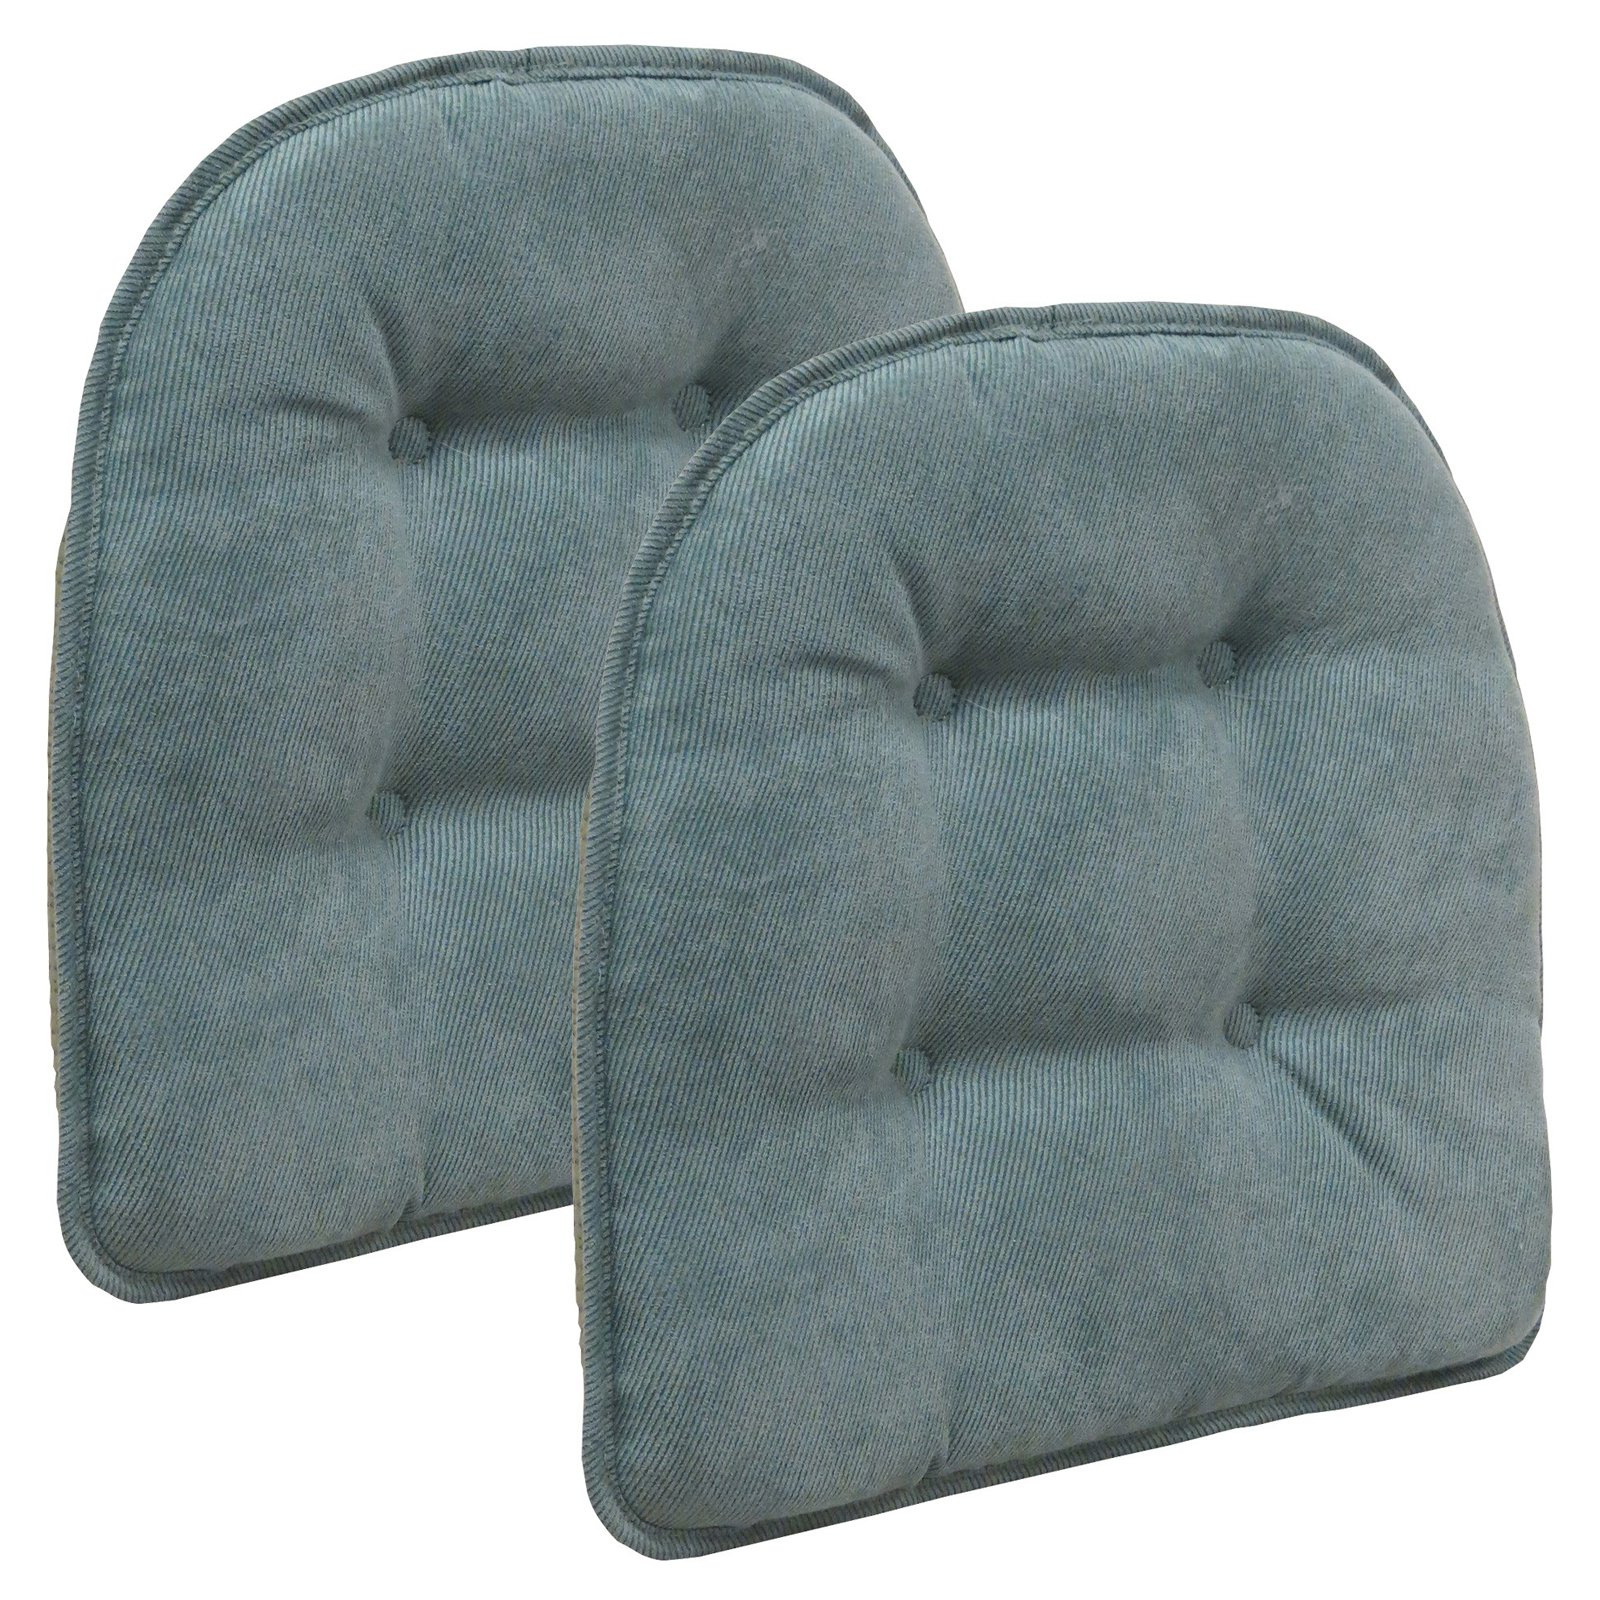 "Gripper Non Slip 15"" x 16"" Nouveau Tufted Chair Cushions, Set of 2"